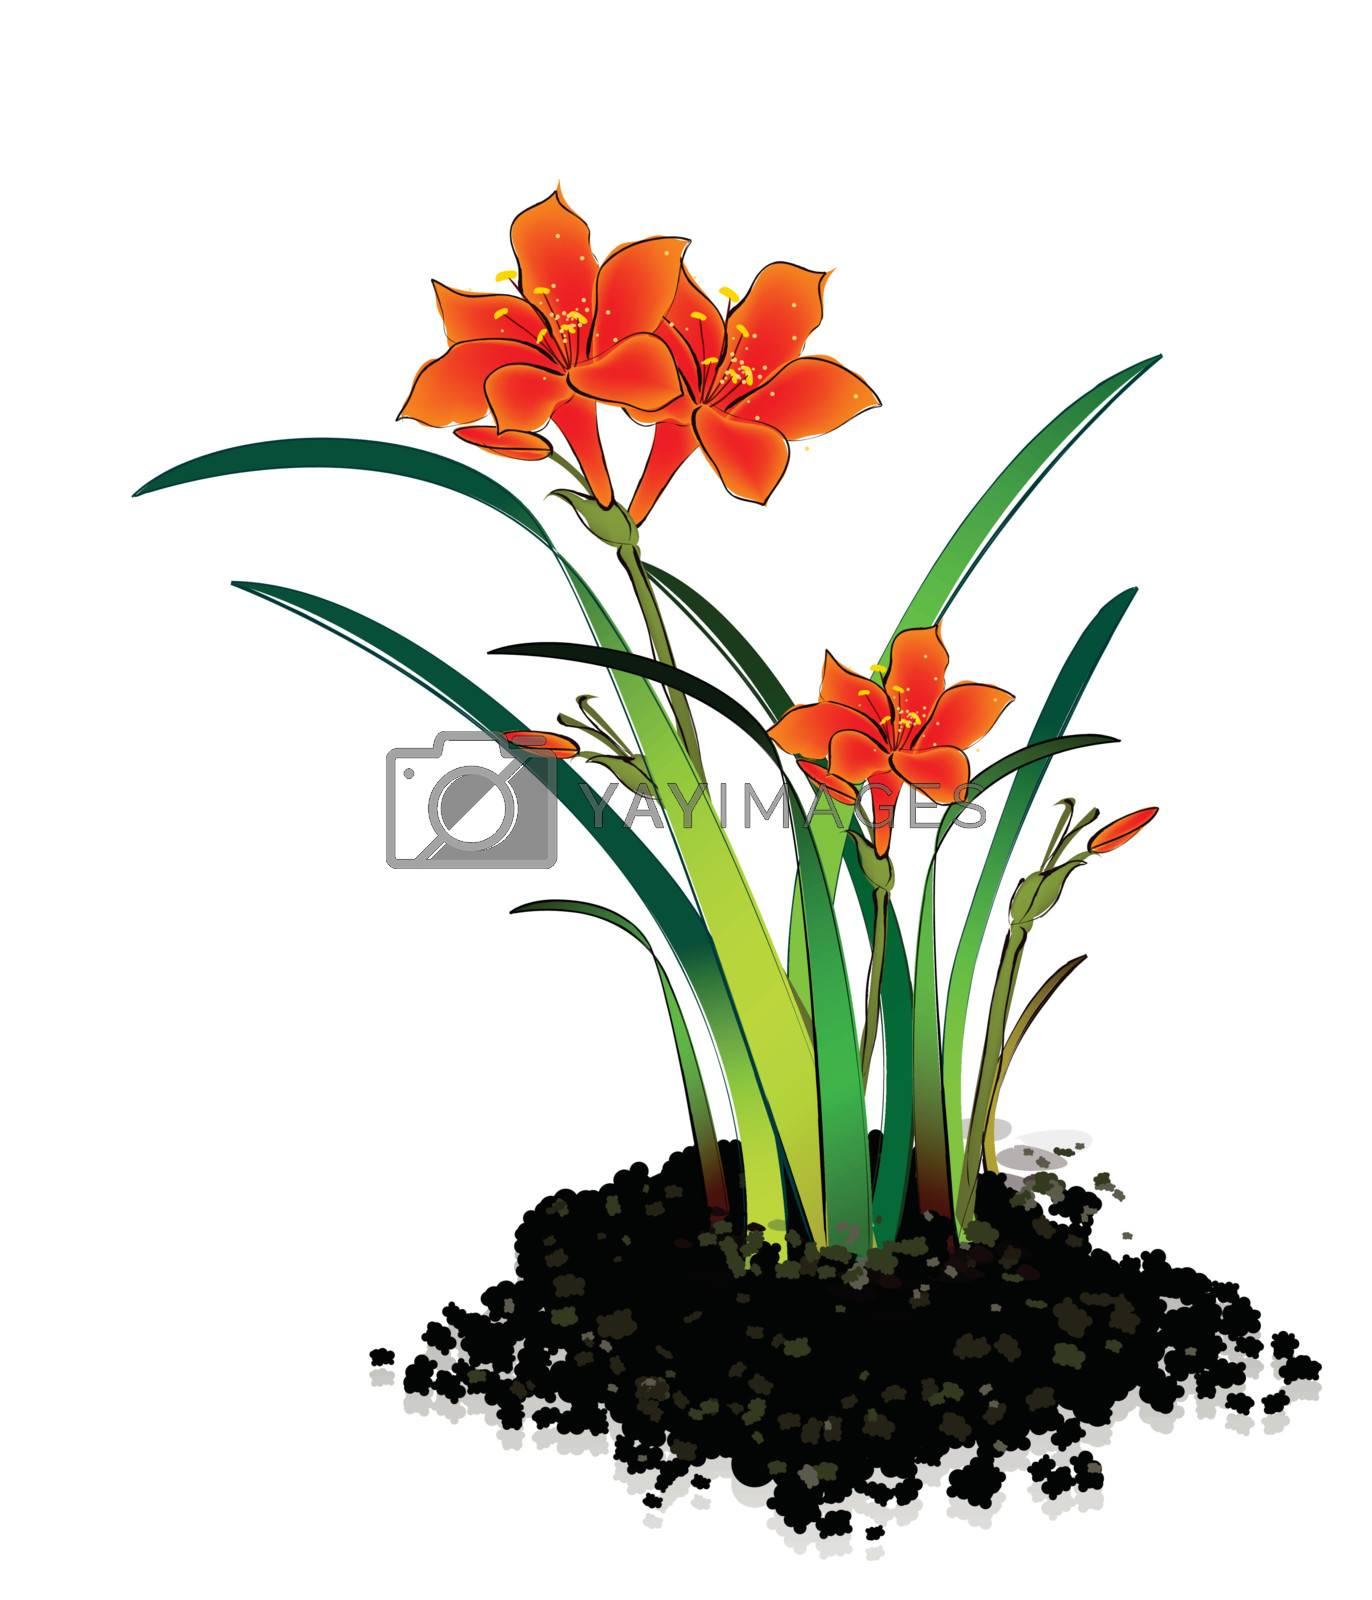 Planting flowers Hippeastrum